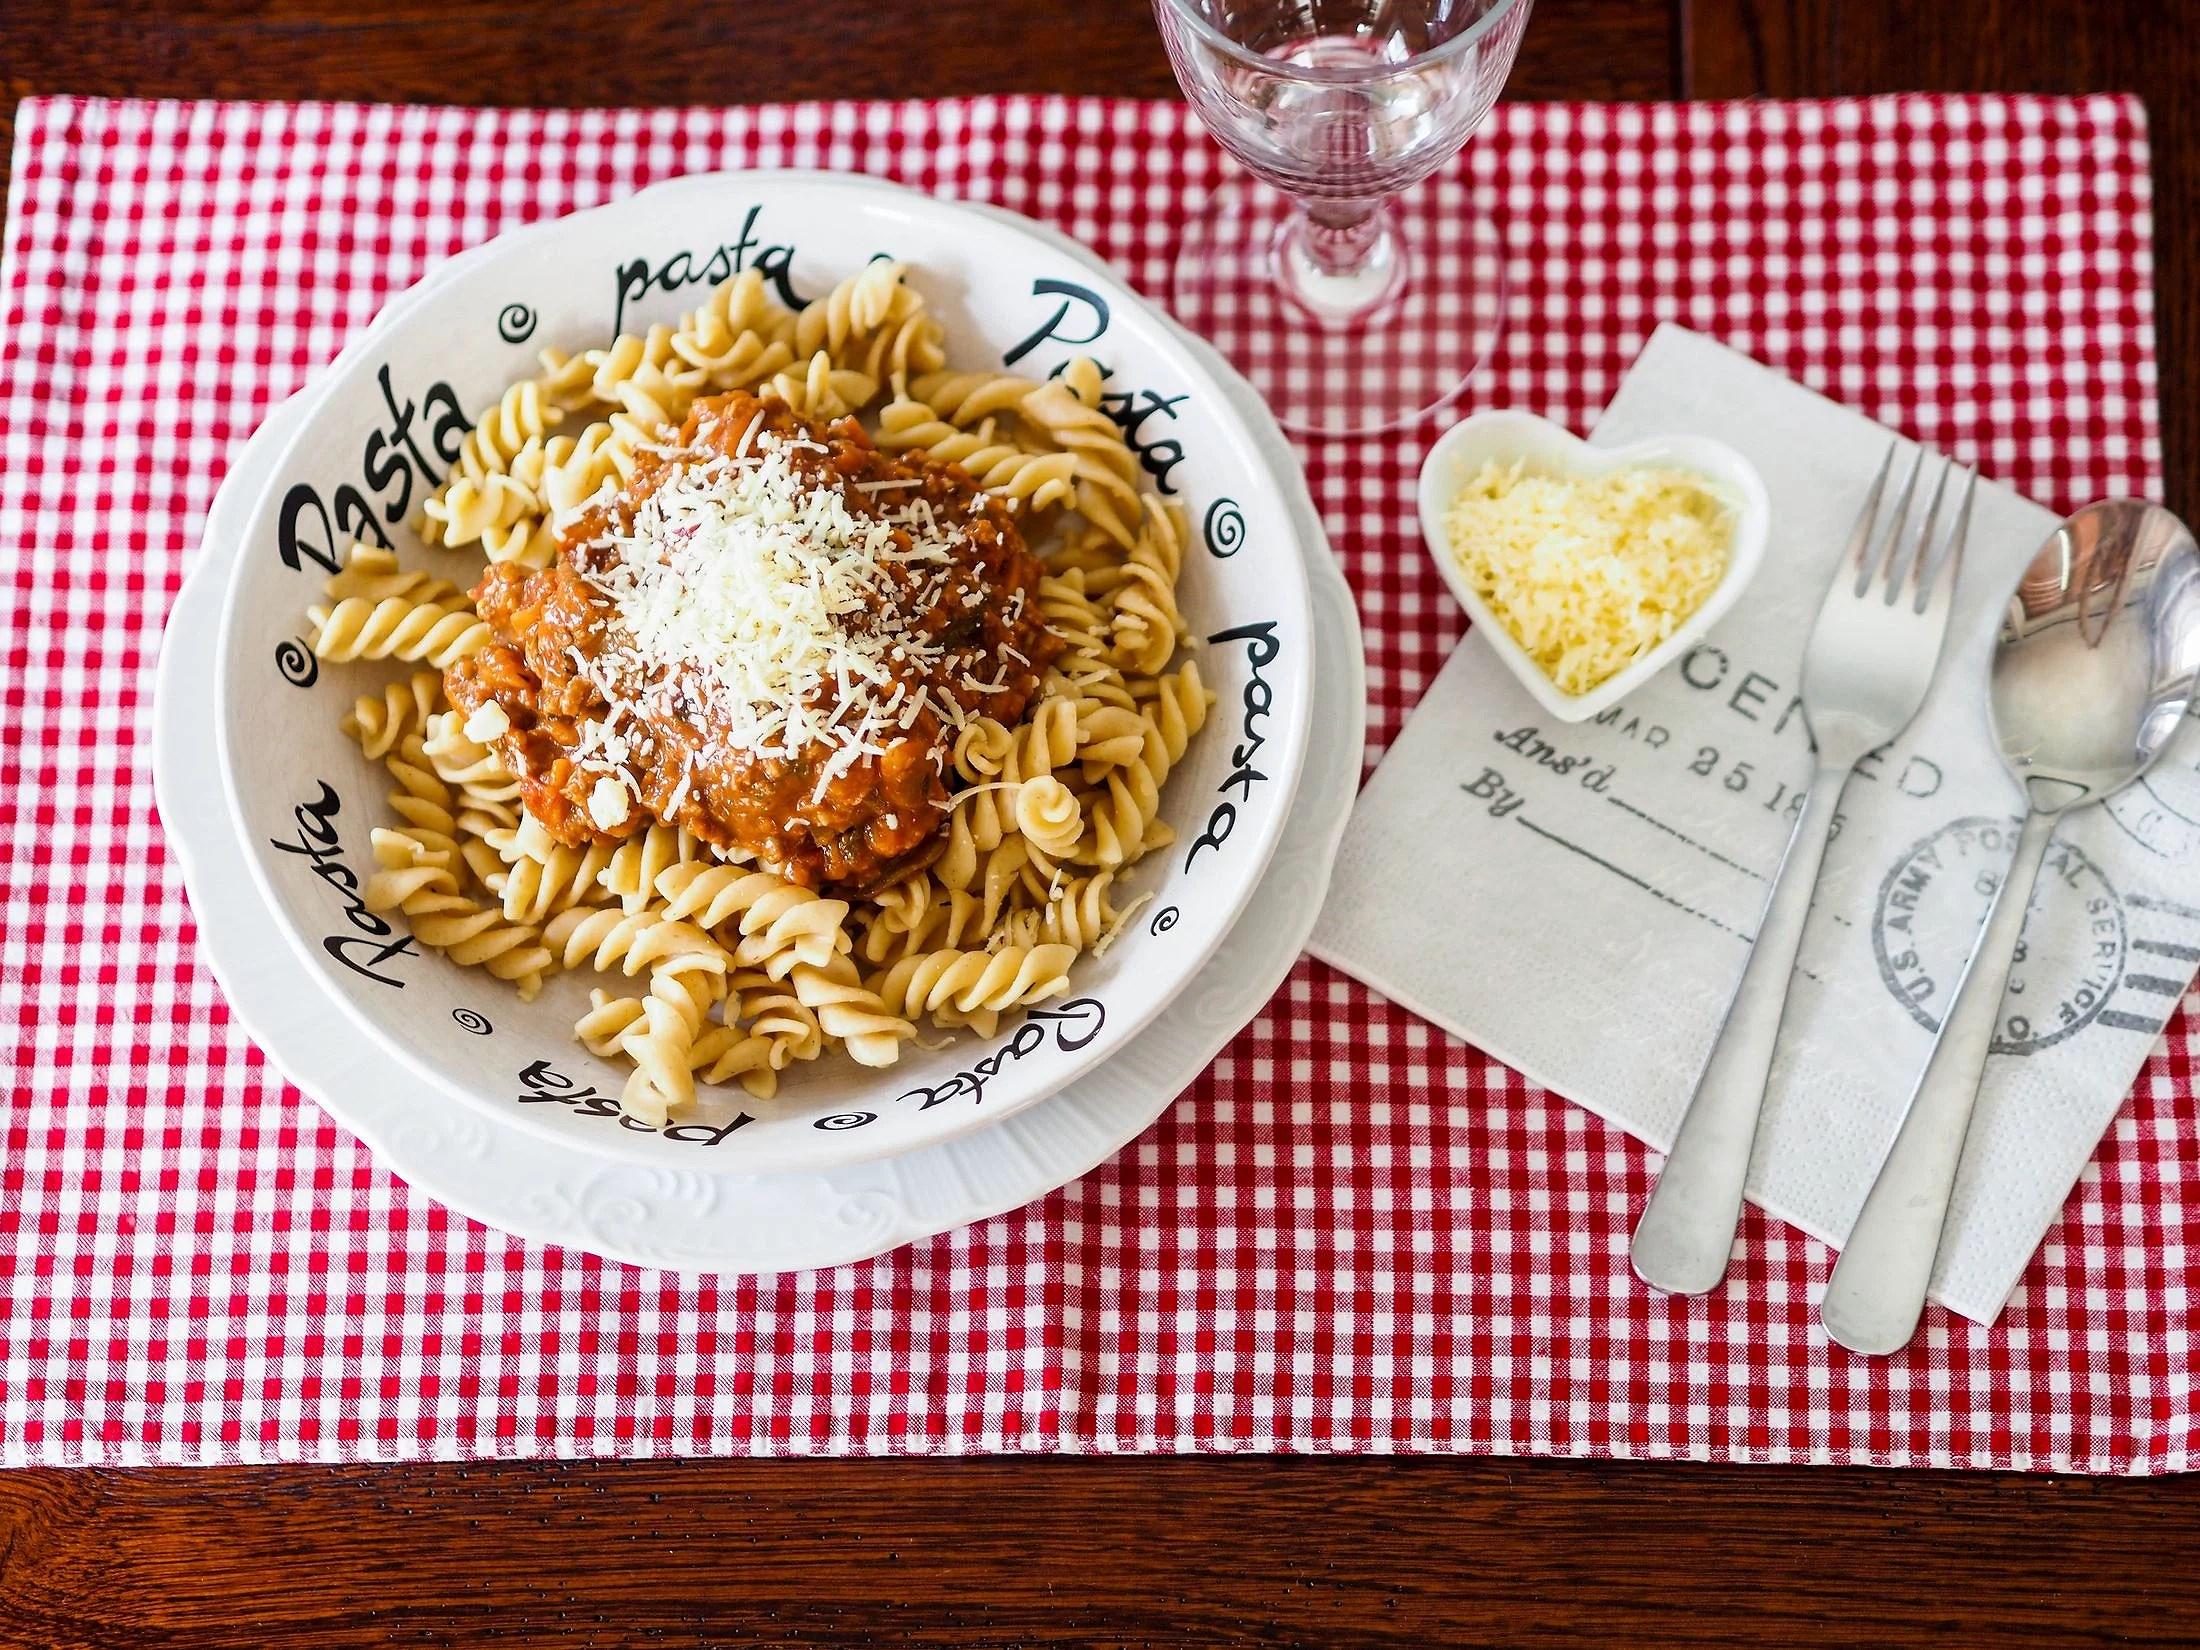 mammas pasta bolognes